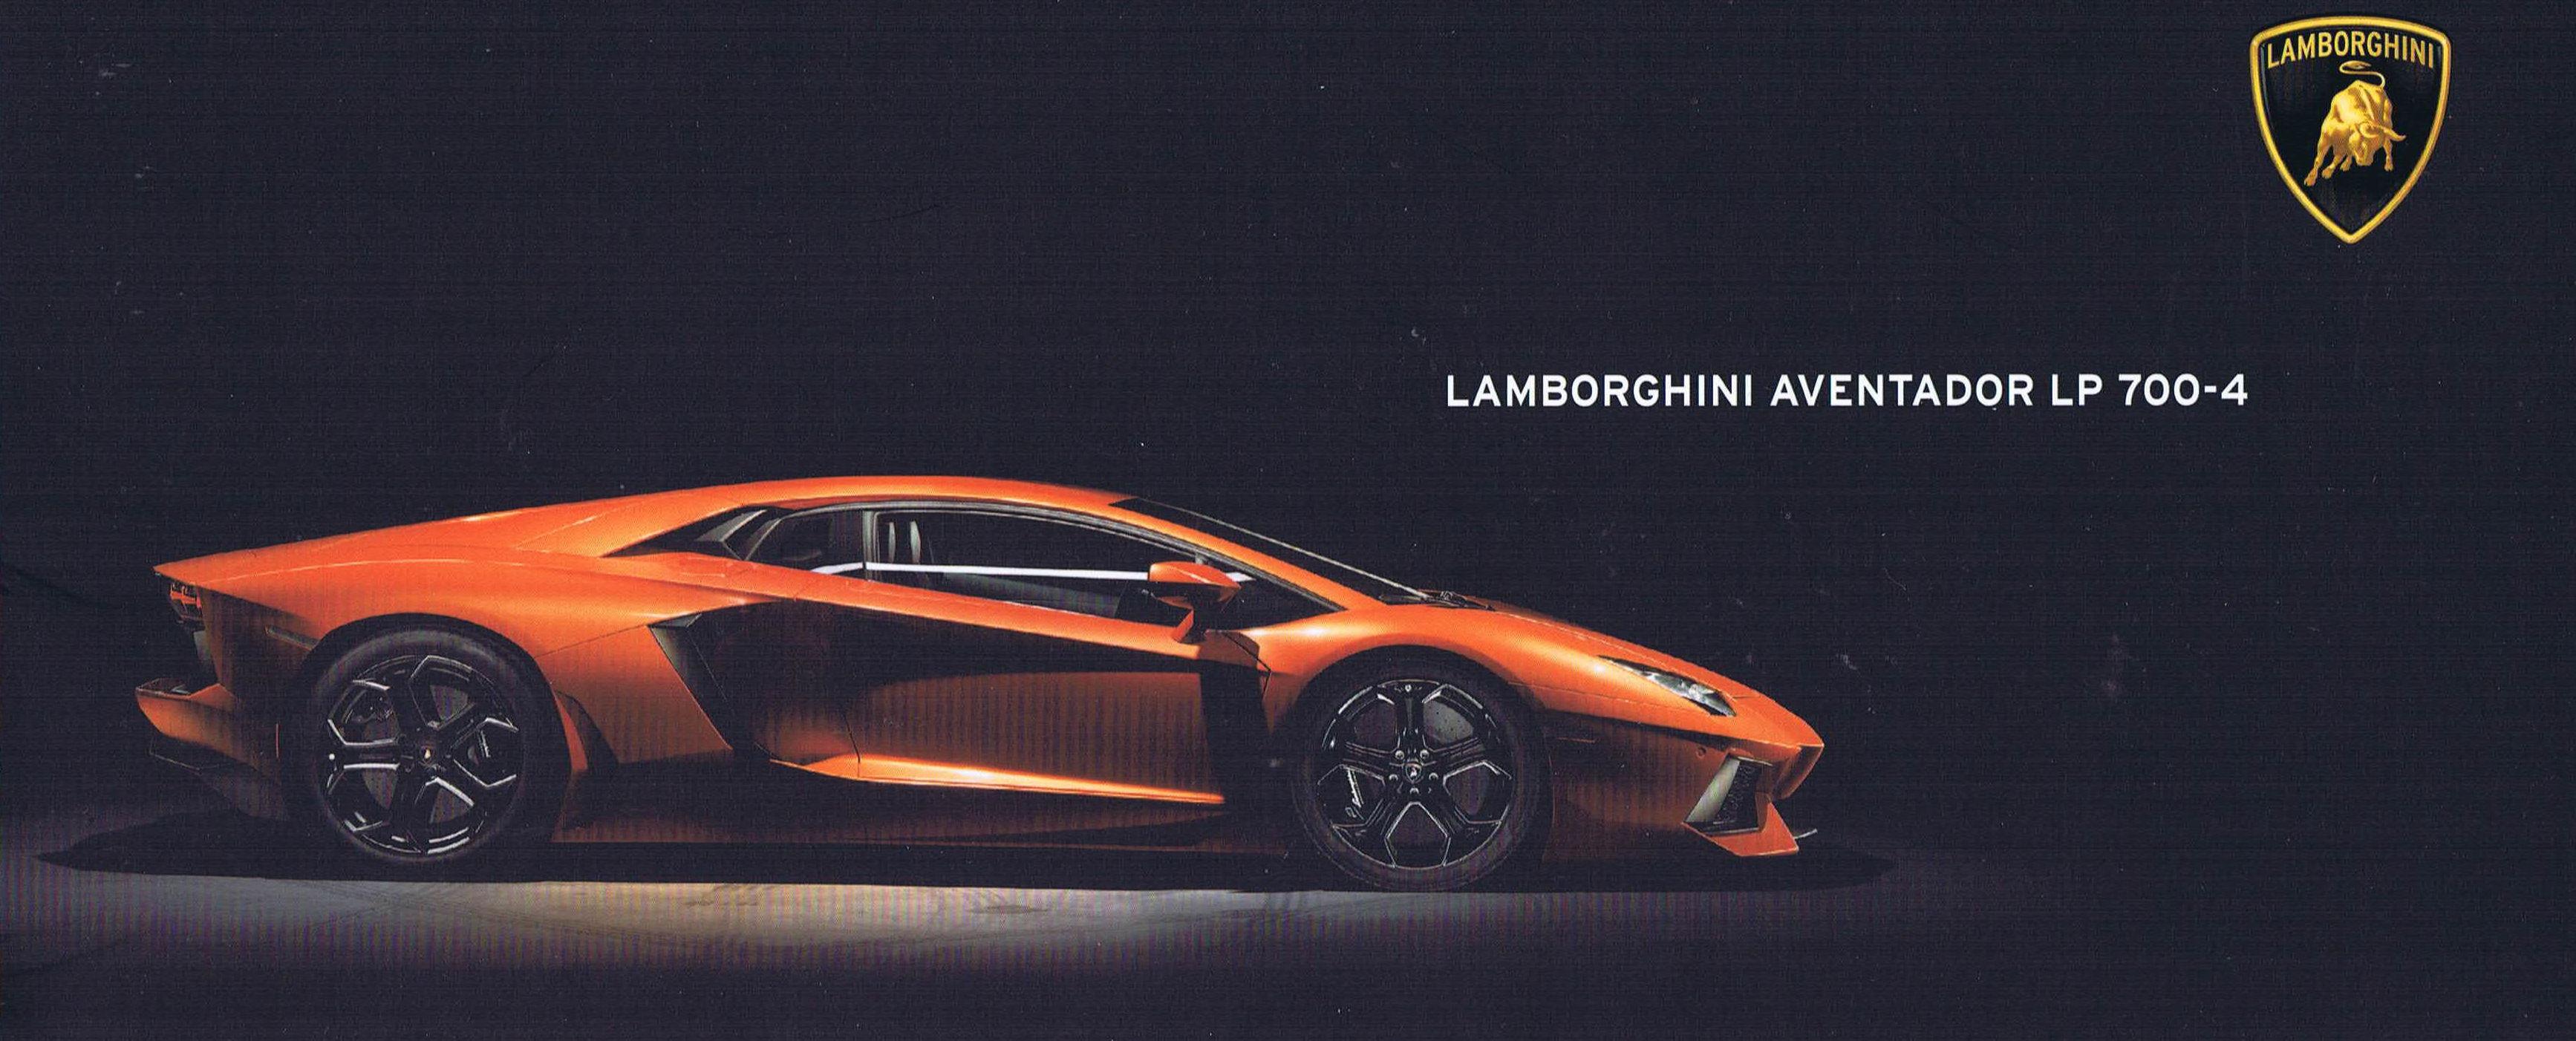 2013 Lamborghini Aventador Brochure